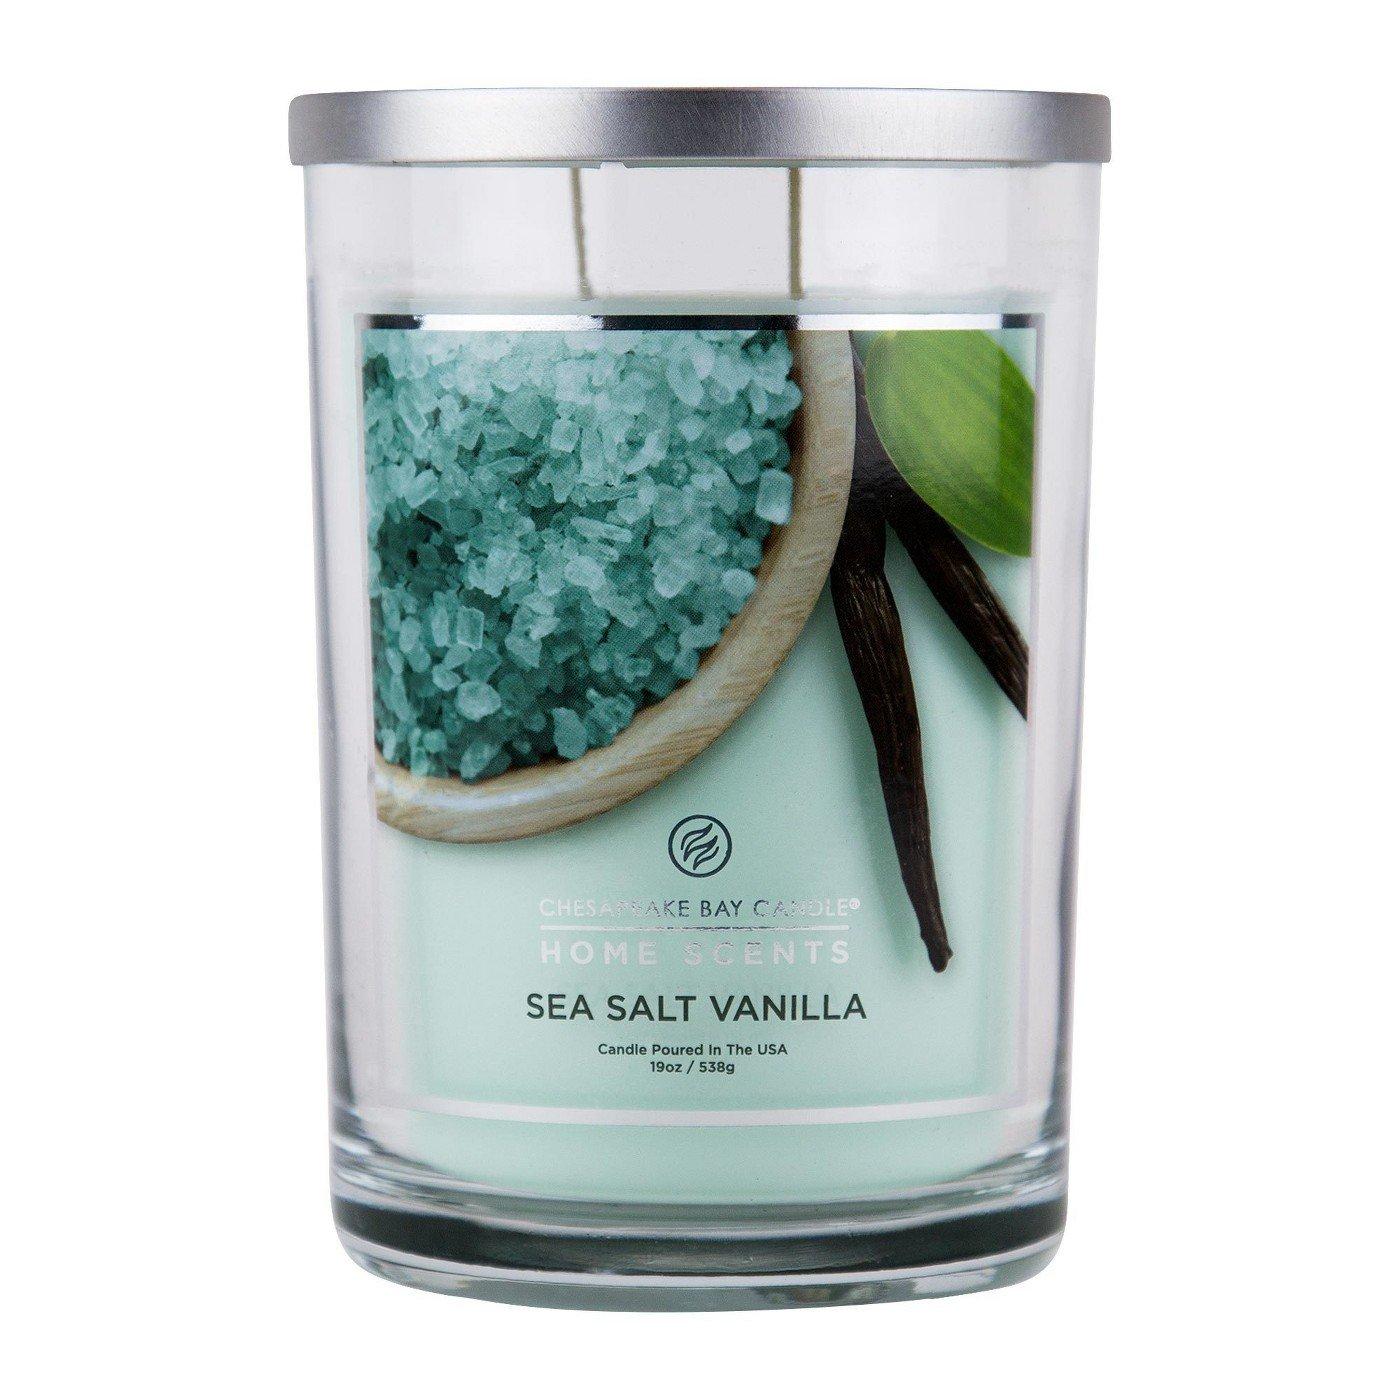 Home Scents by Candles Chesapeake Bay Candle Chesapeake Bay Jar Candle Sea Salt Vanilla